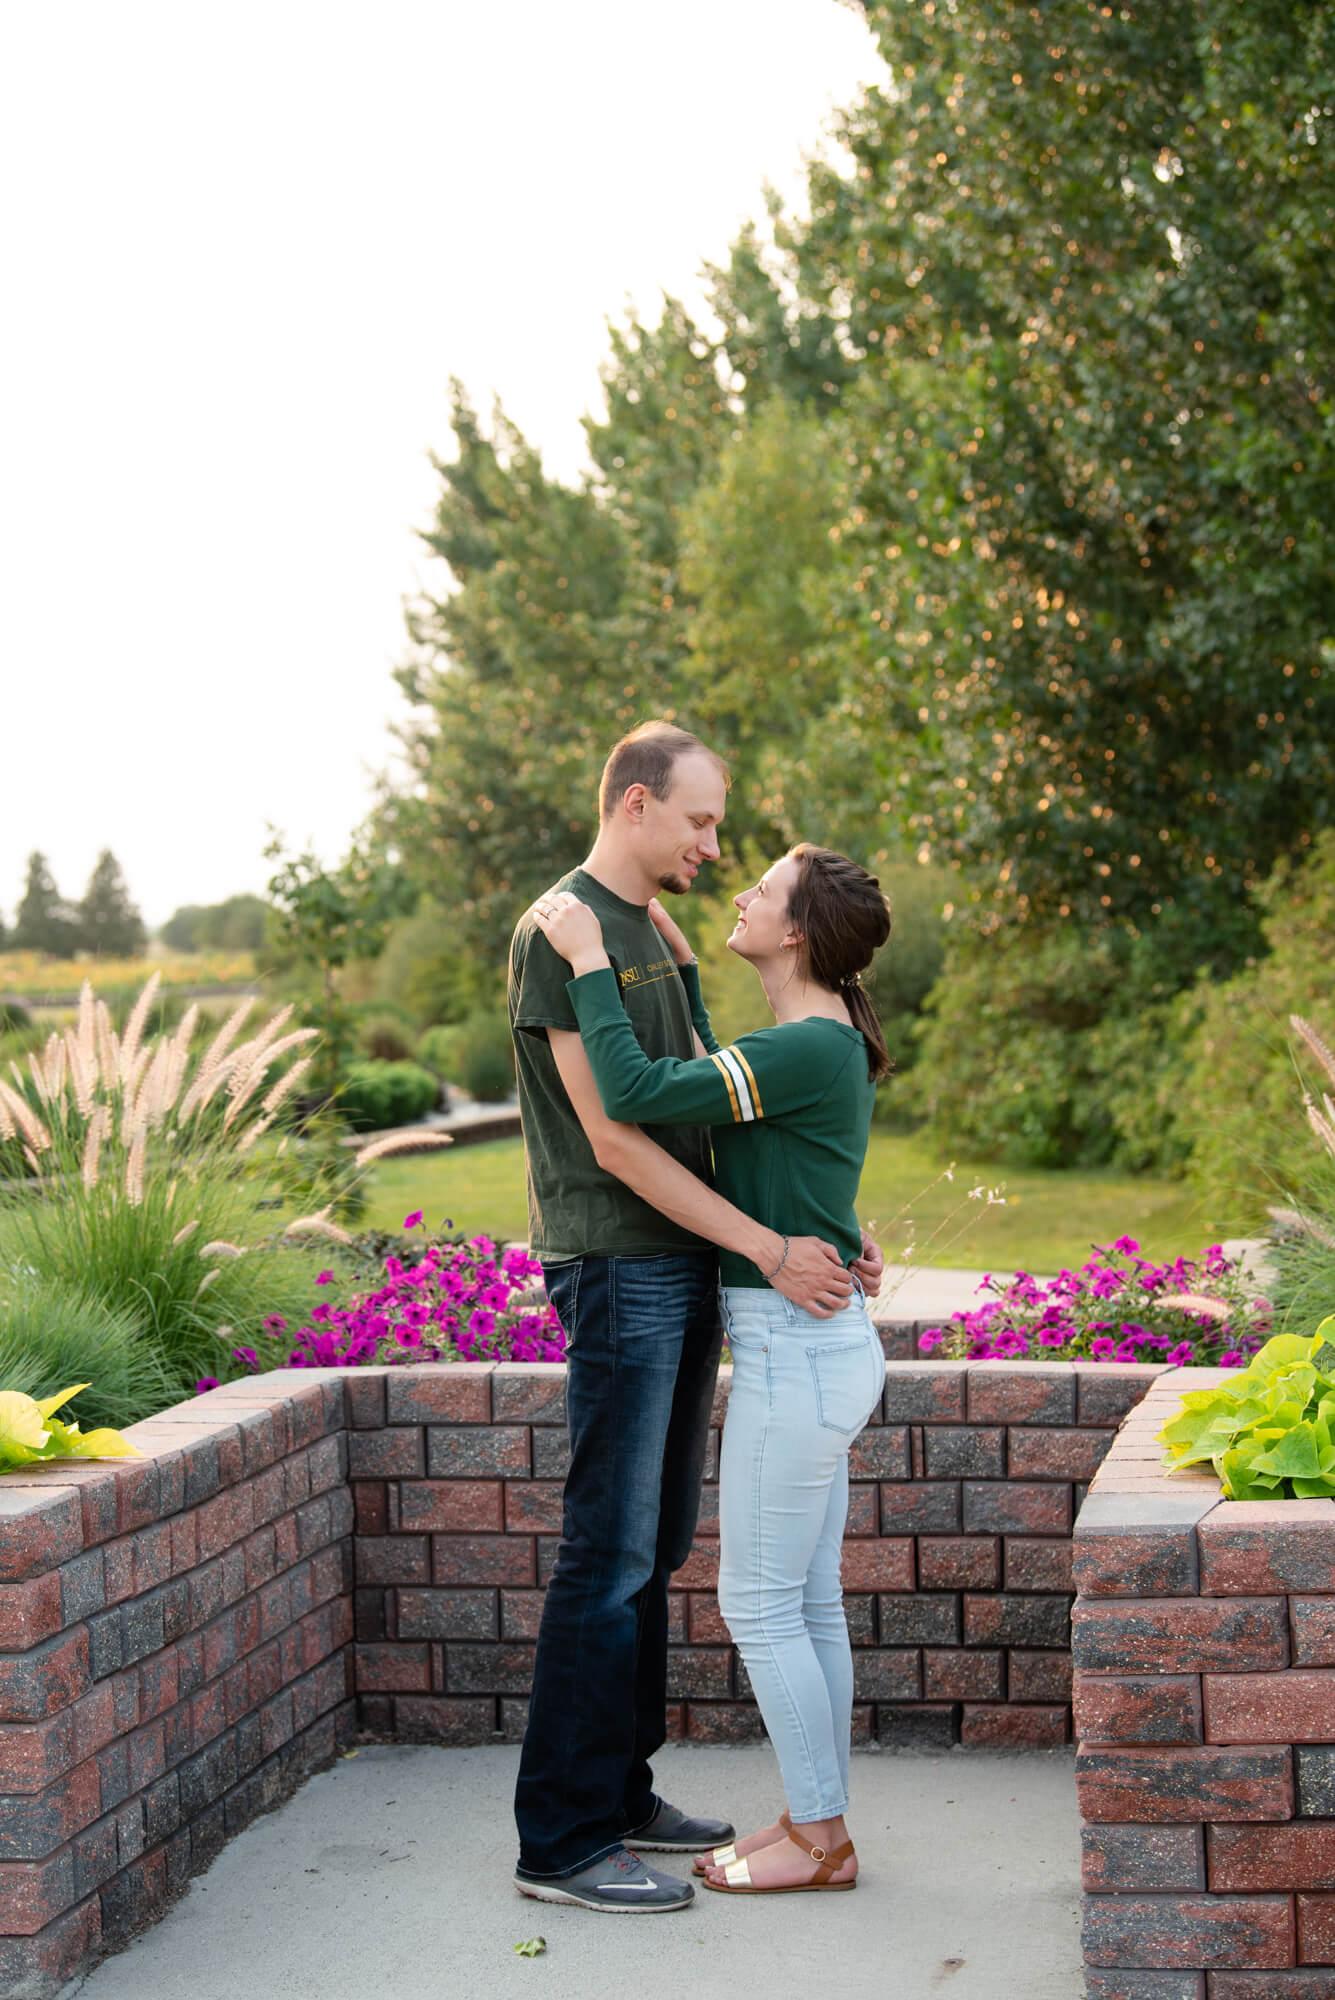 DSC 5103 - John and Faith's Engagement   Fargo, North Dakota